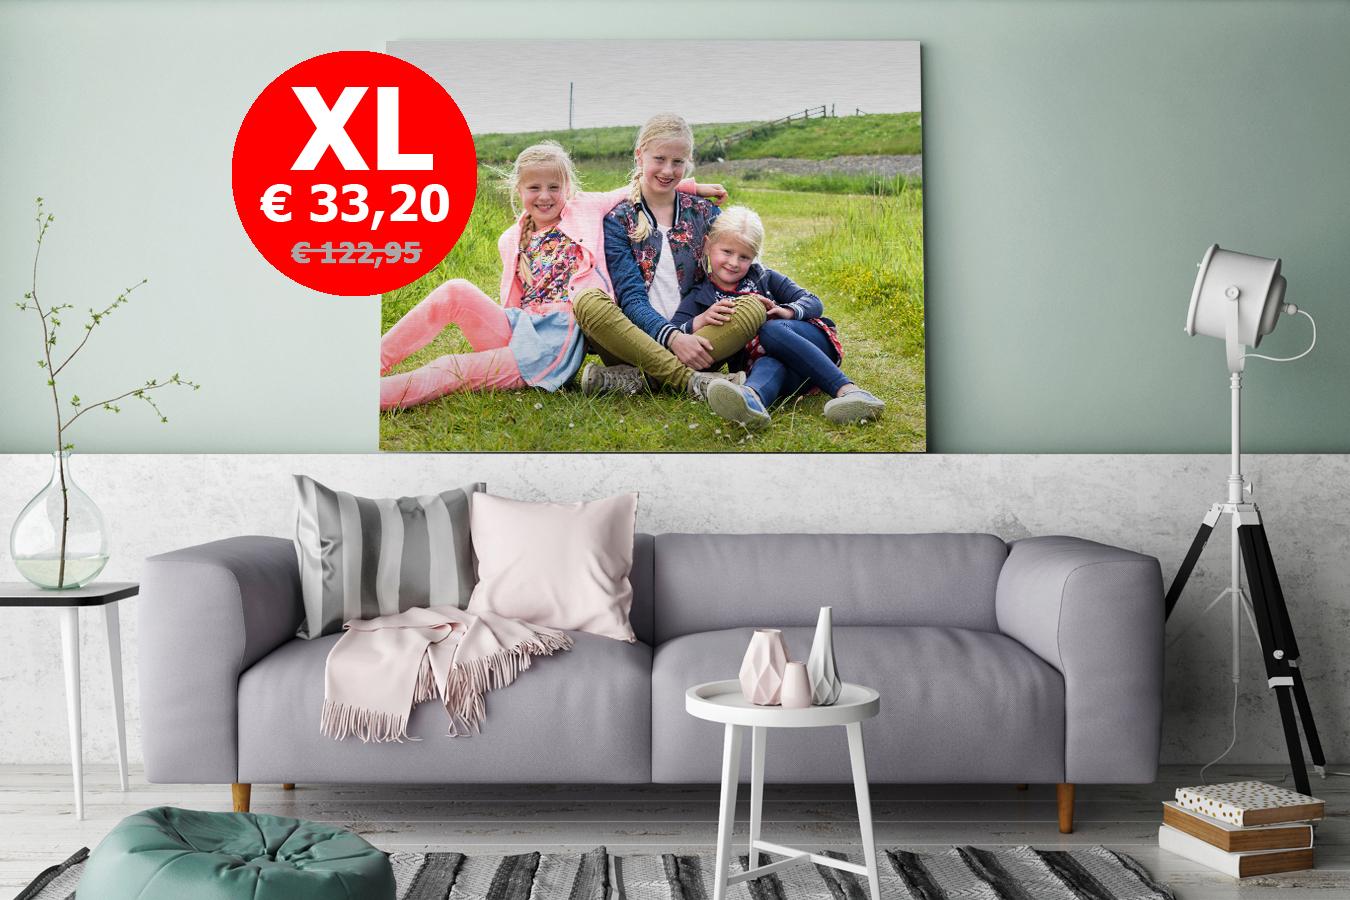 XL - Aluminium foto 120x80 cm - t.w.v € 122,95